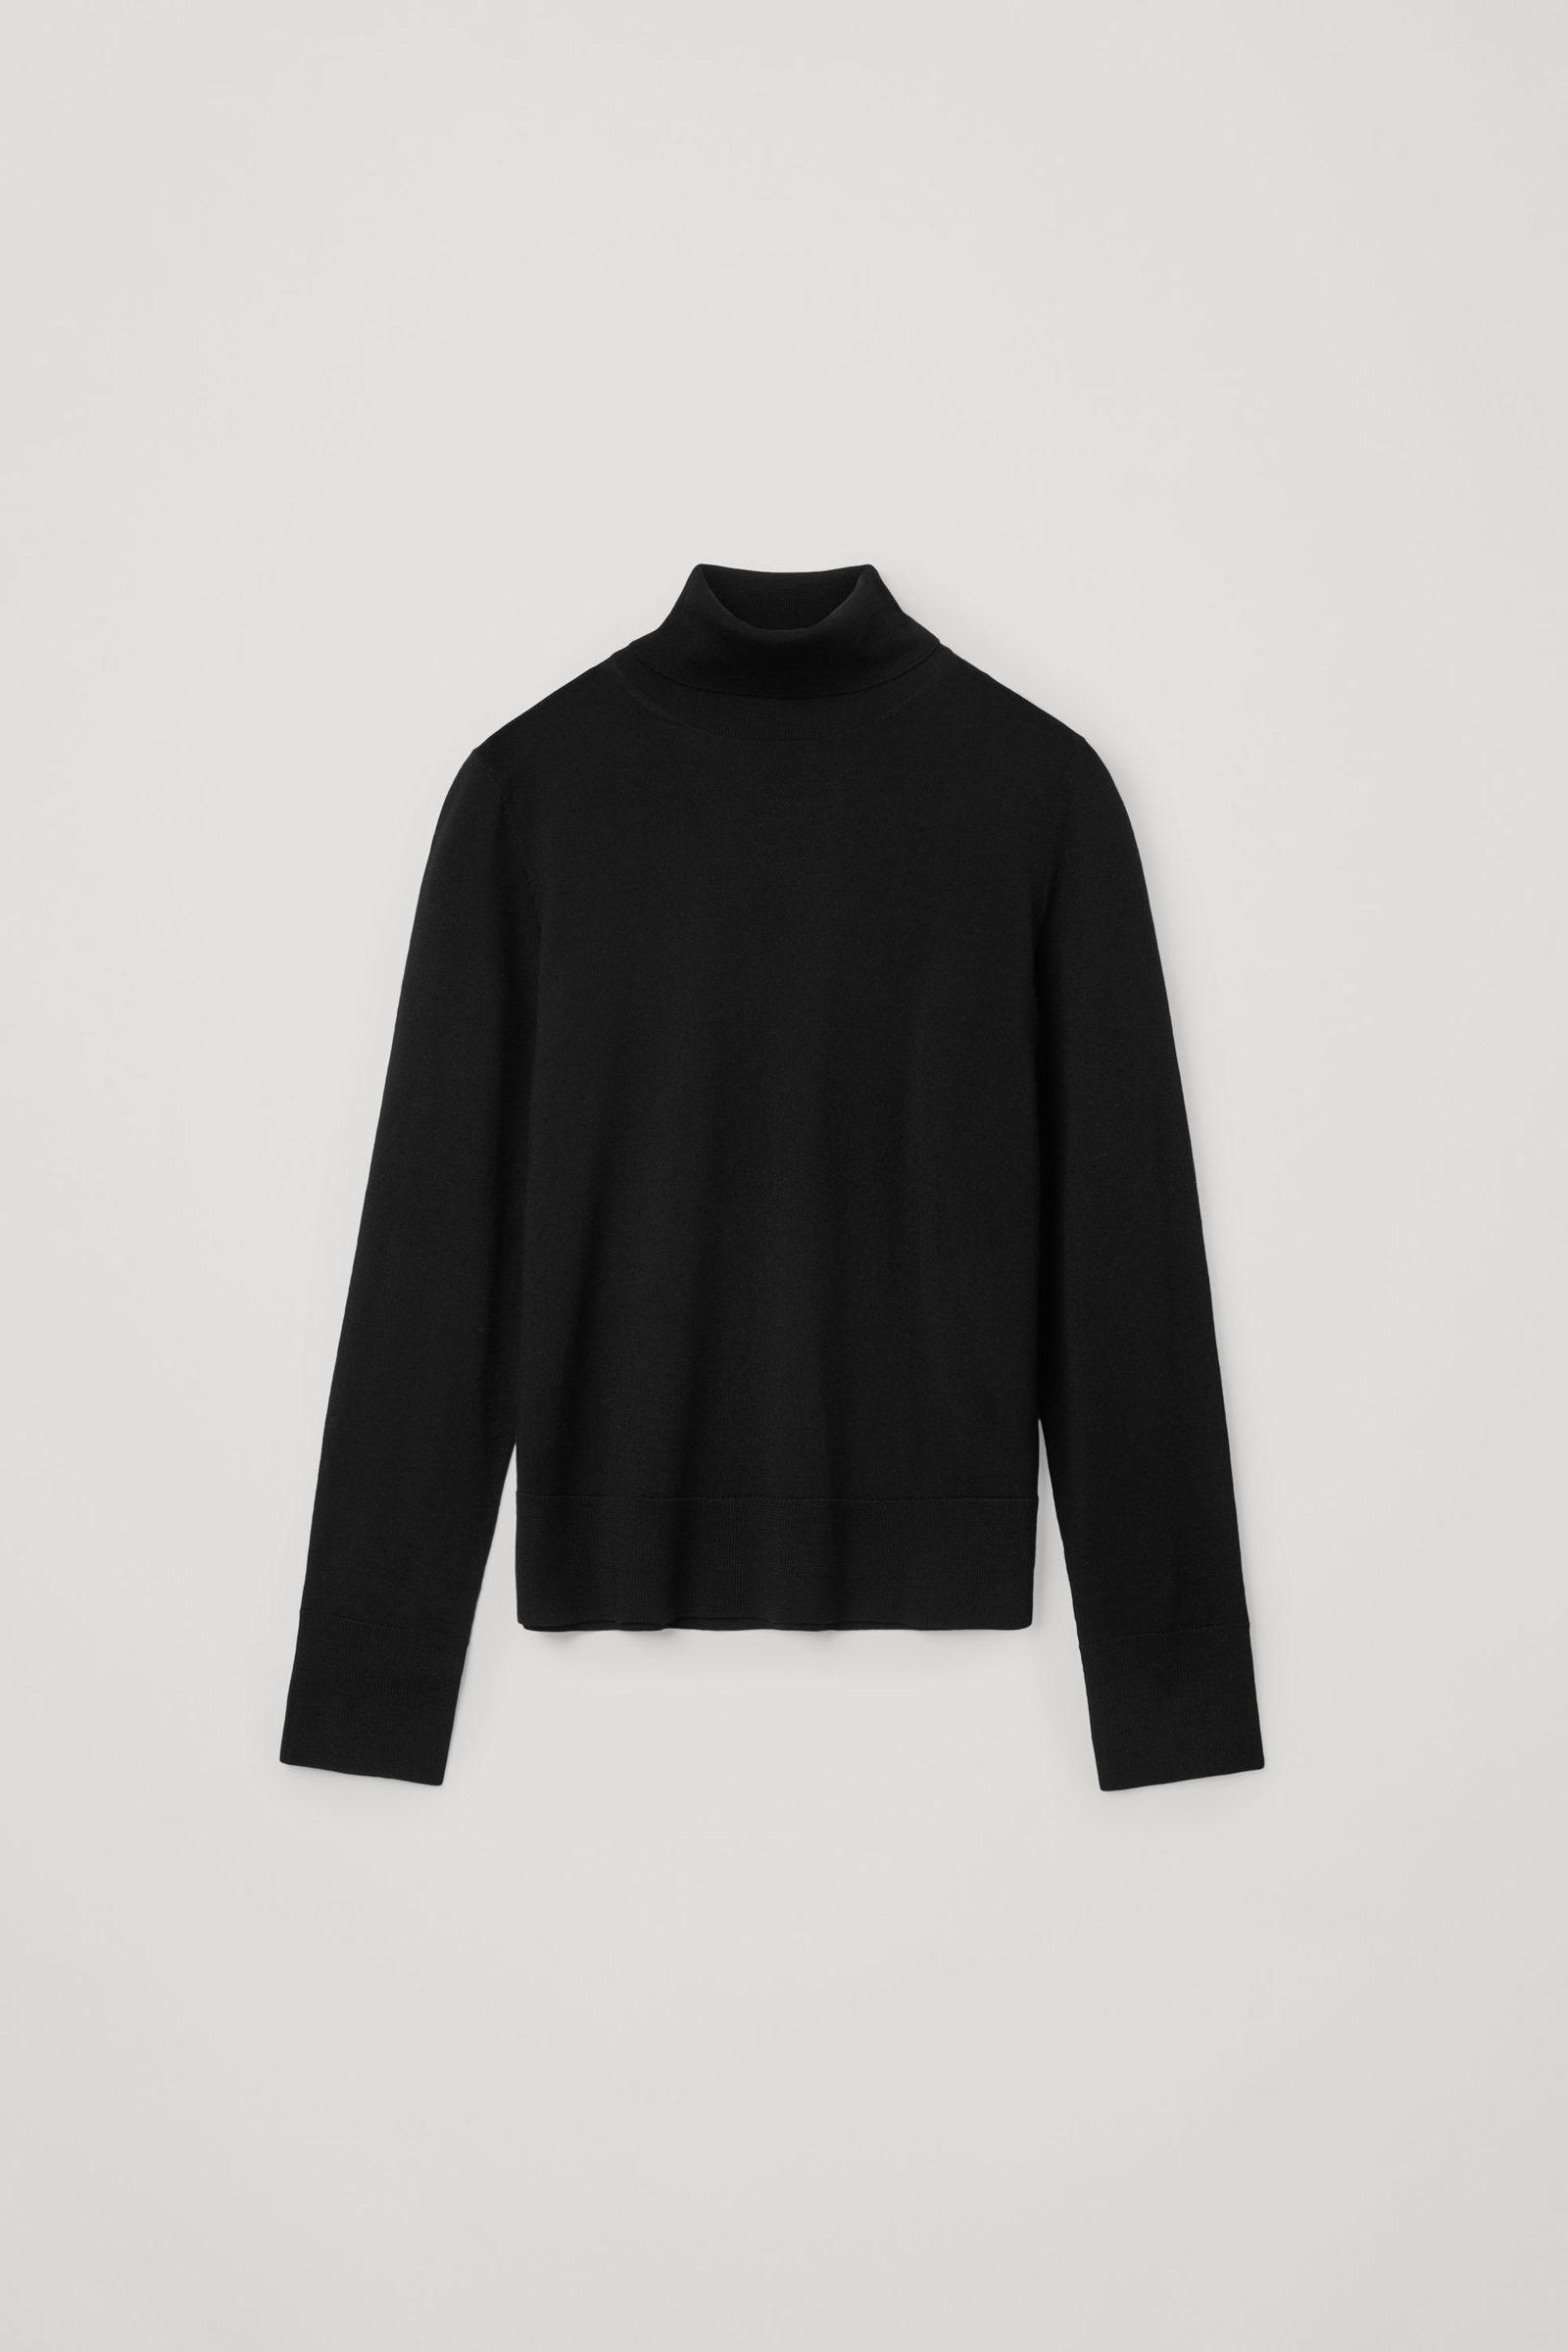 COS 메리노 울 롤넥 스웨터의 블랙컬러 Product입니다.